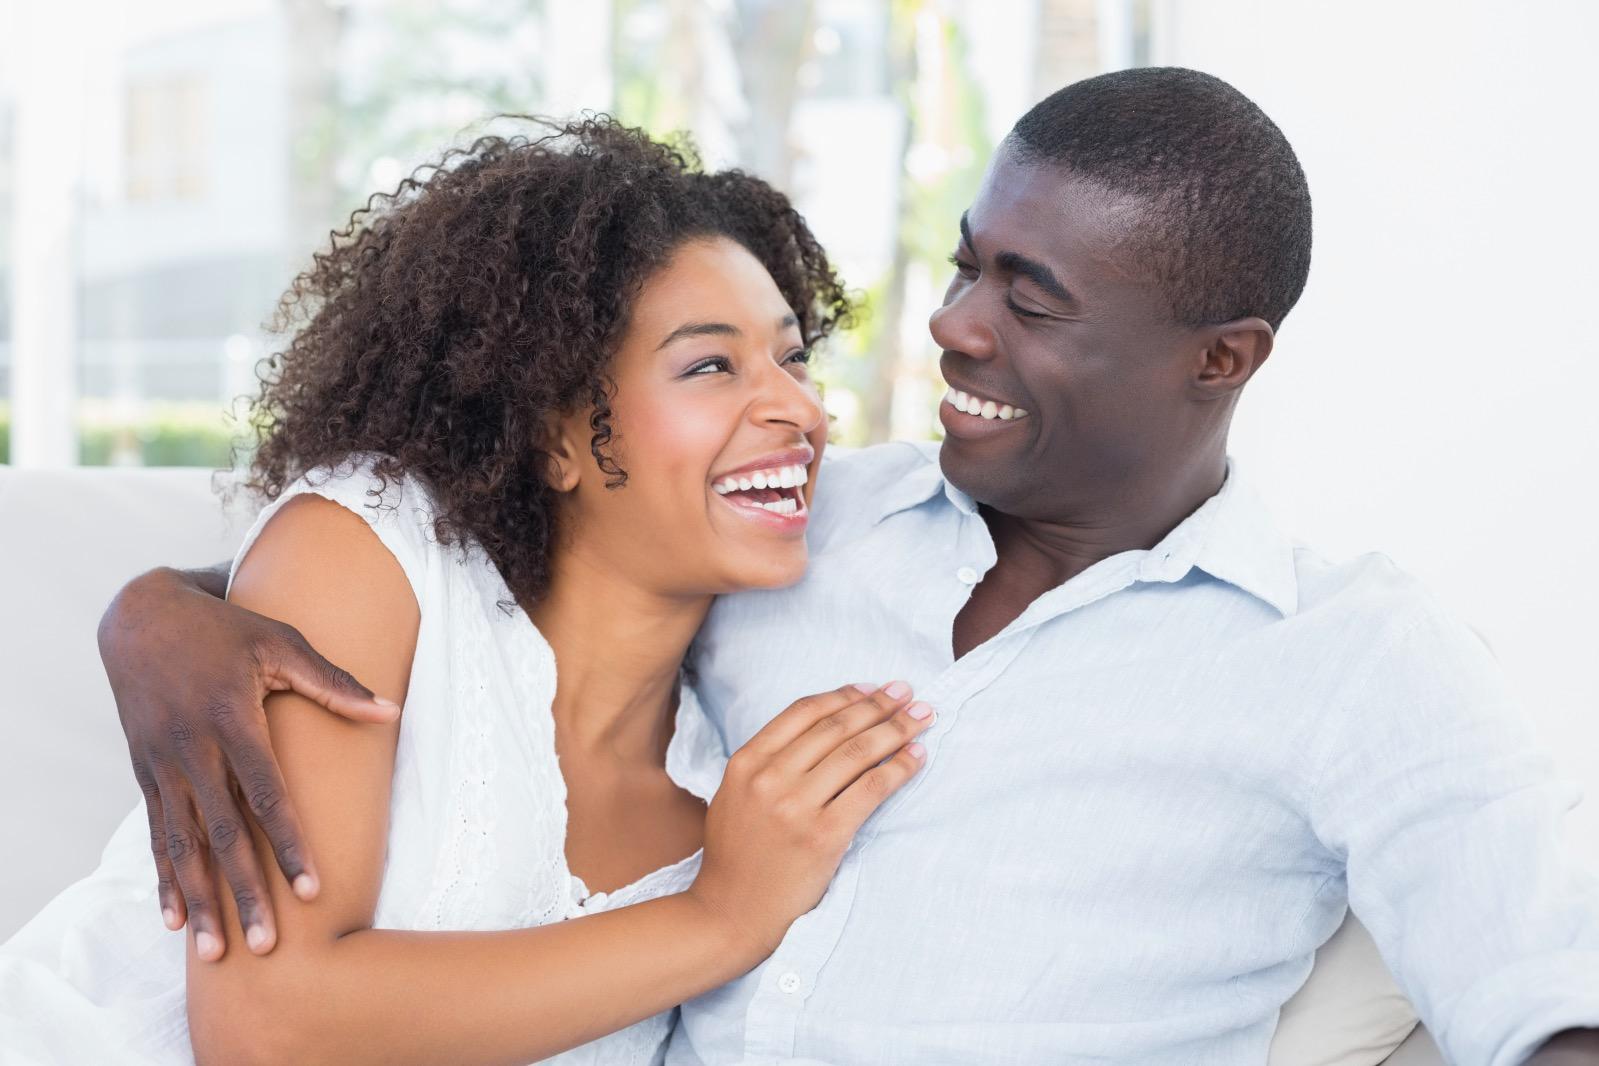 matchmaking dating service Hur man kan tjäna pengar online dating